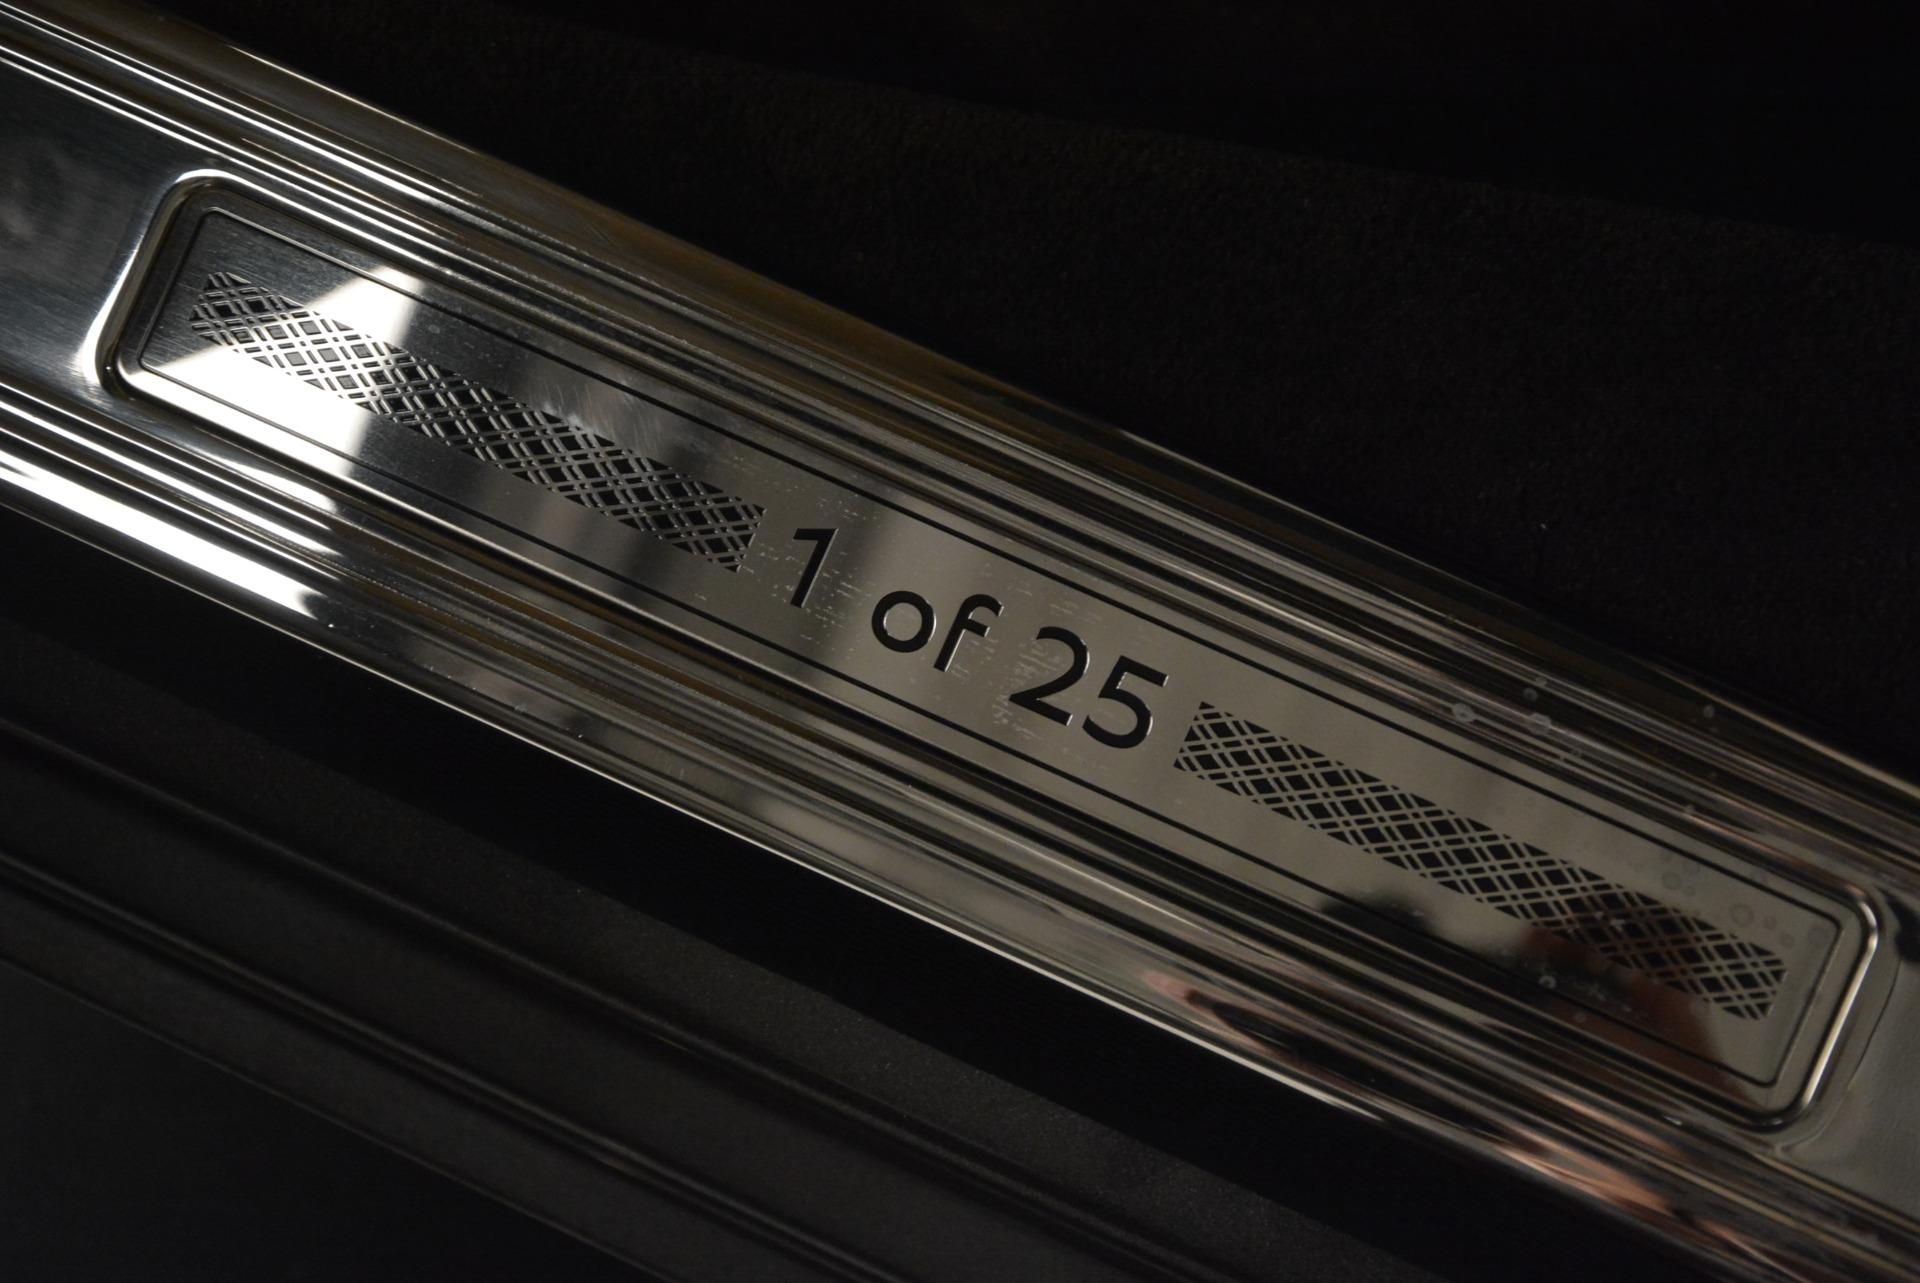 Used 2017 Bentley Mulsanne EWB For Sale In Greenwich, CT 1554_p10